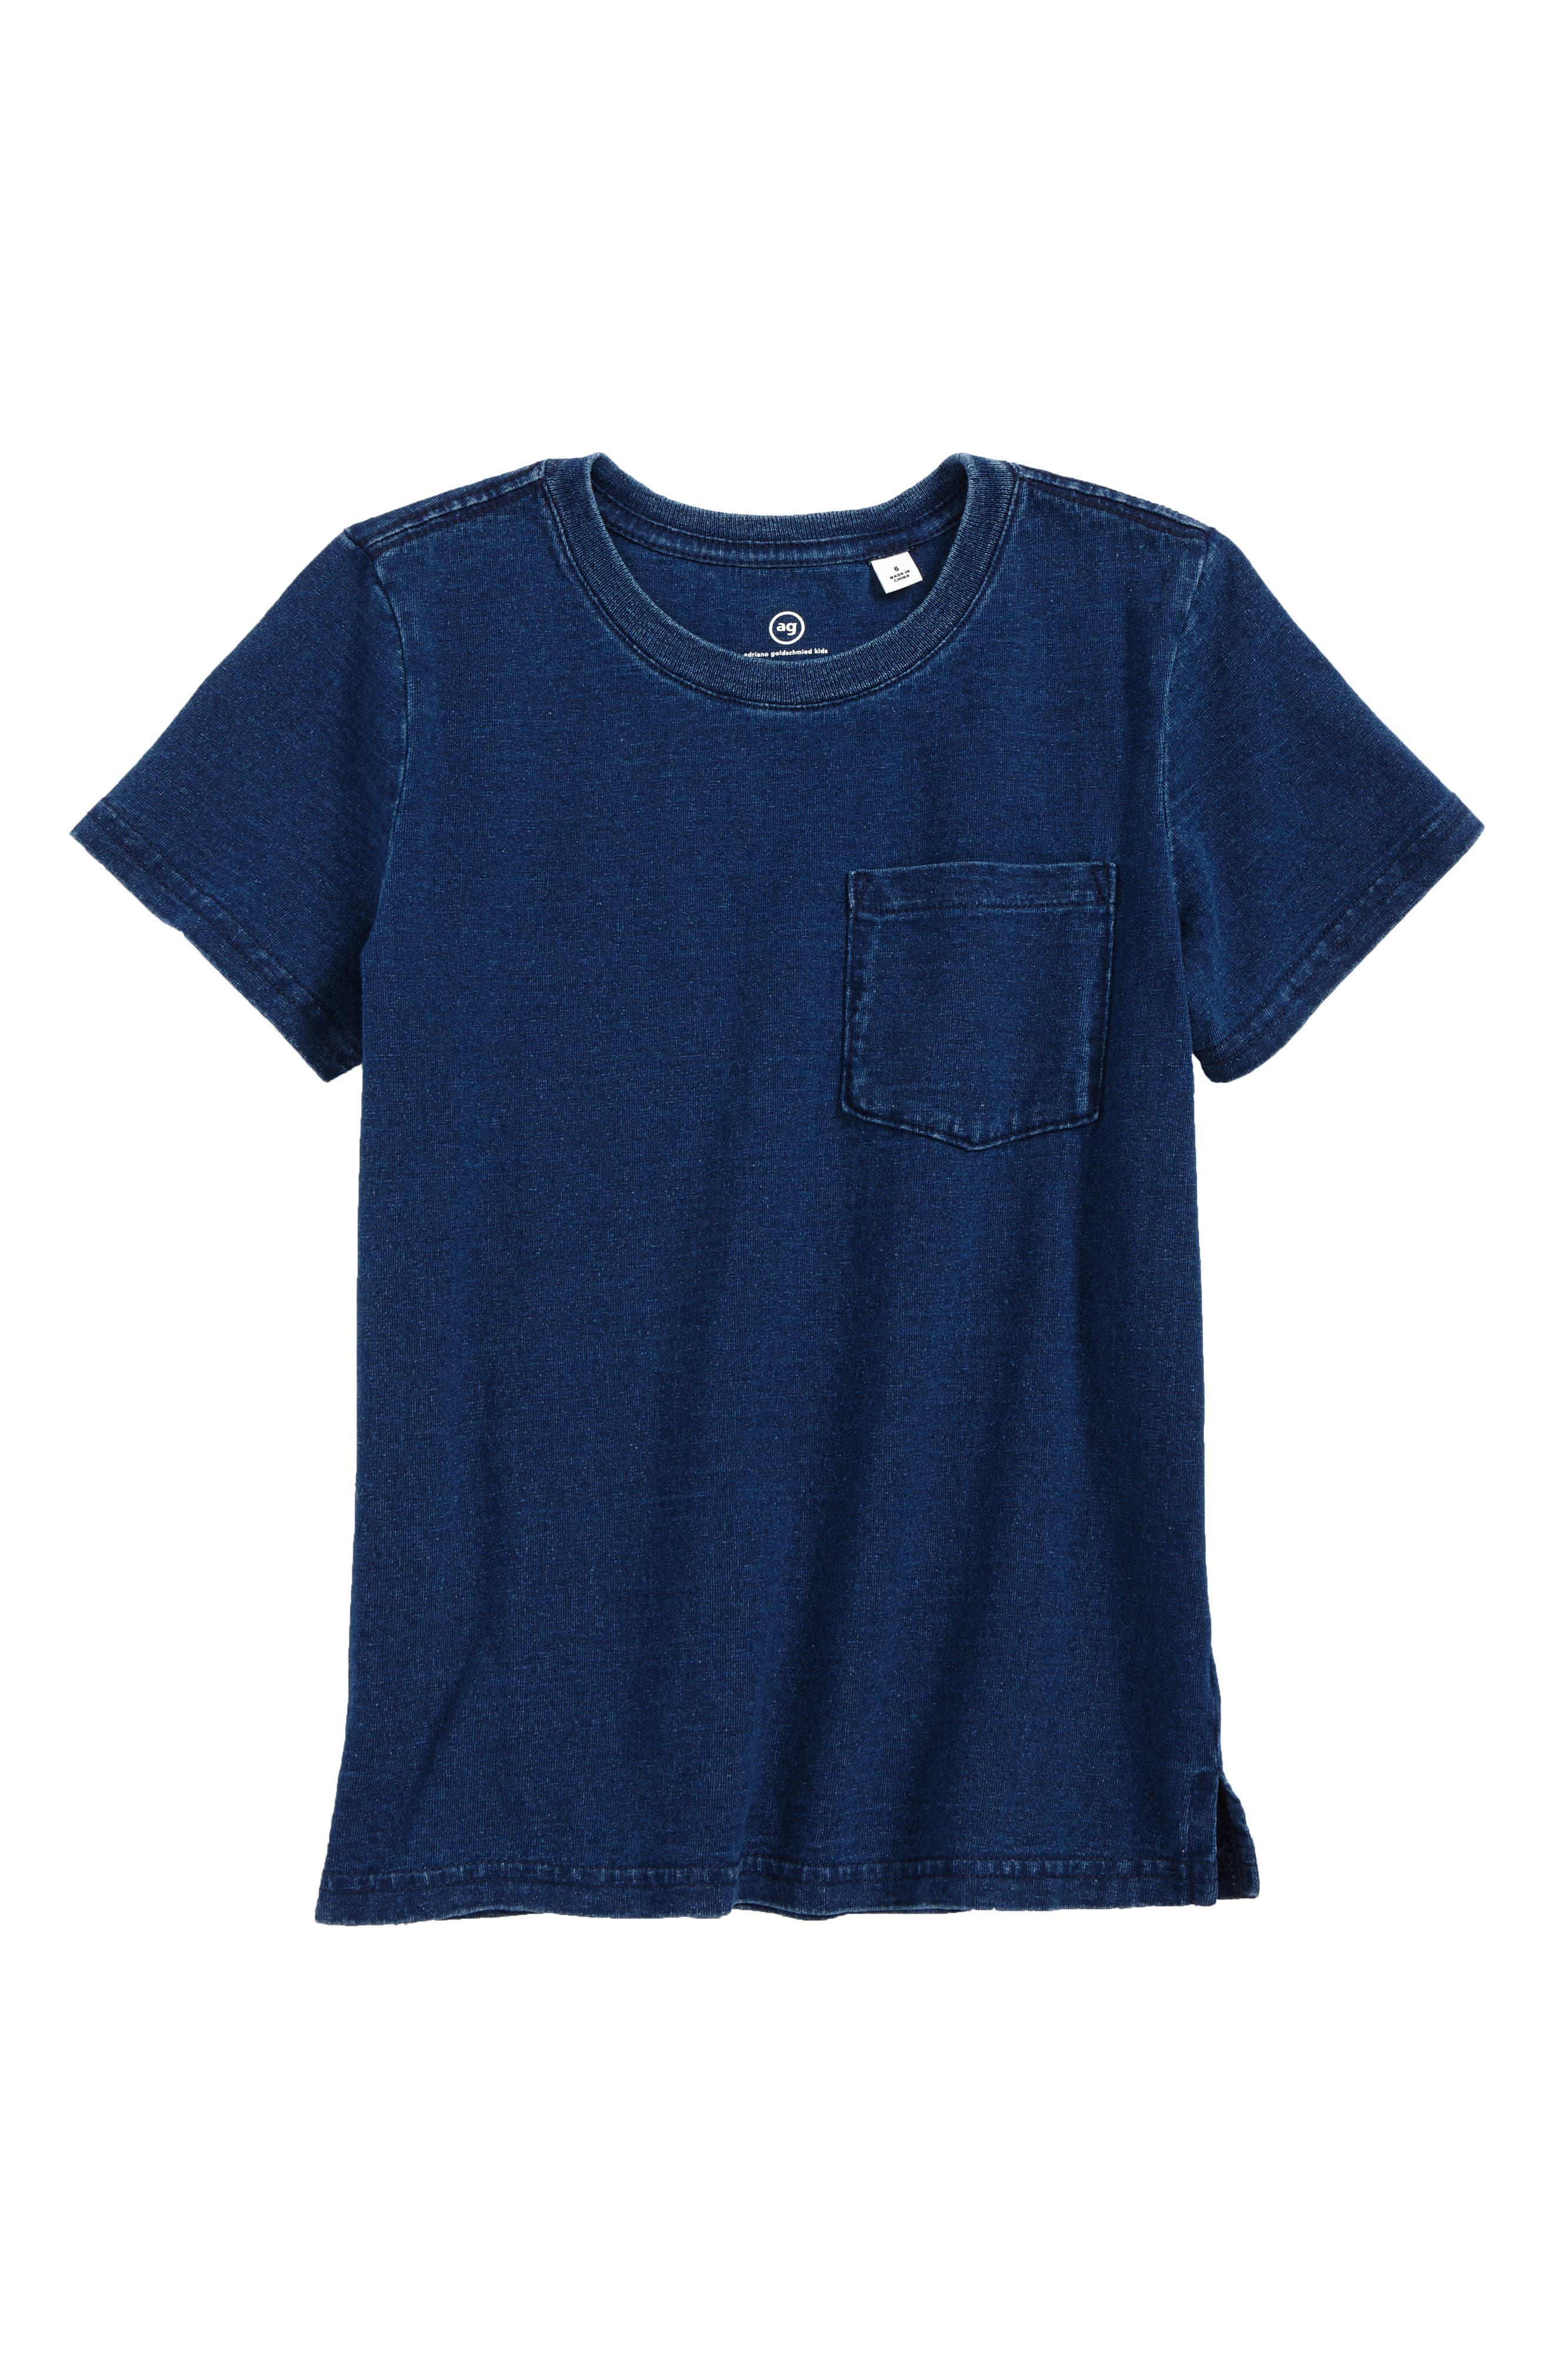 AG Pigment T-Shirt,                             Main thumbnail 1, color,